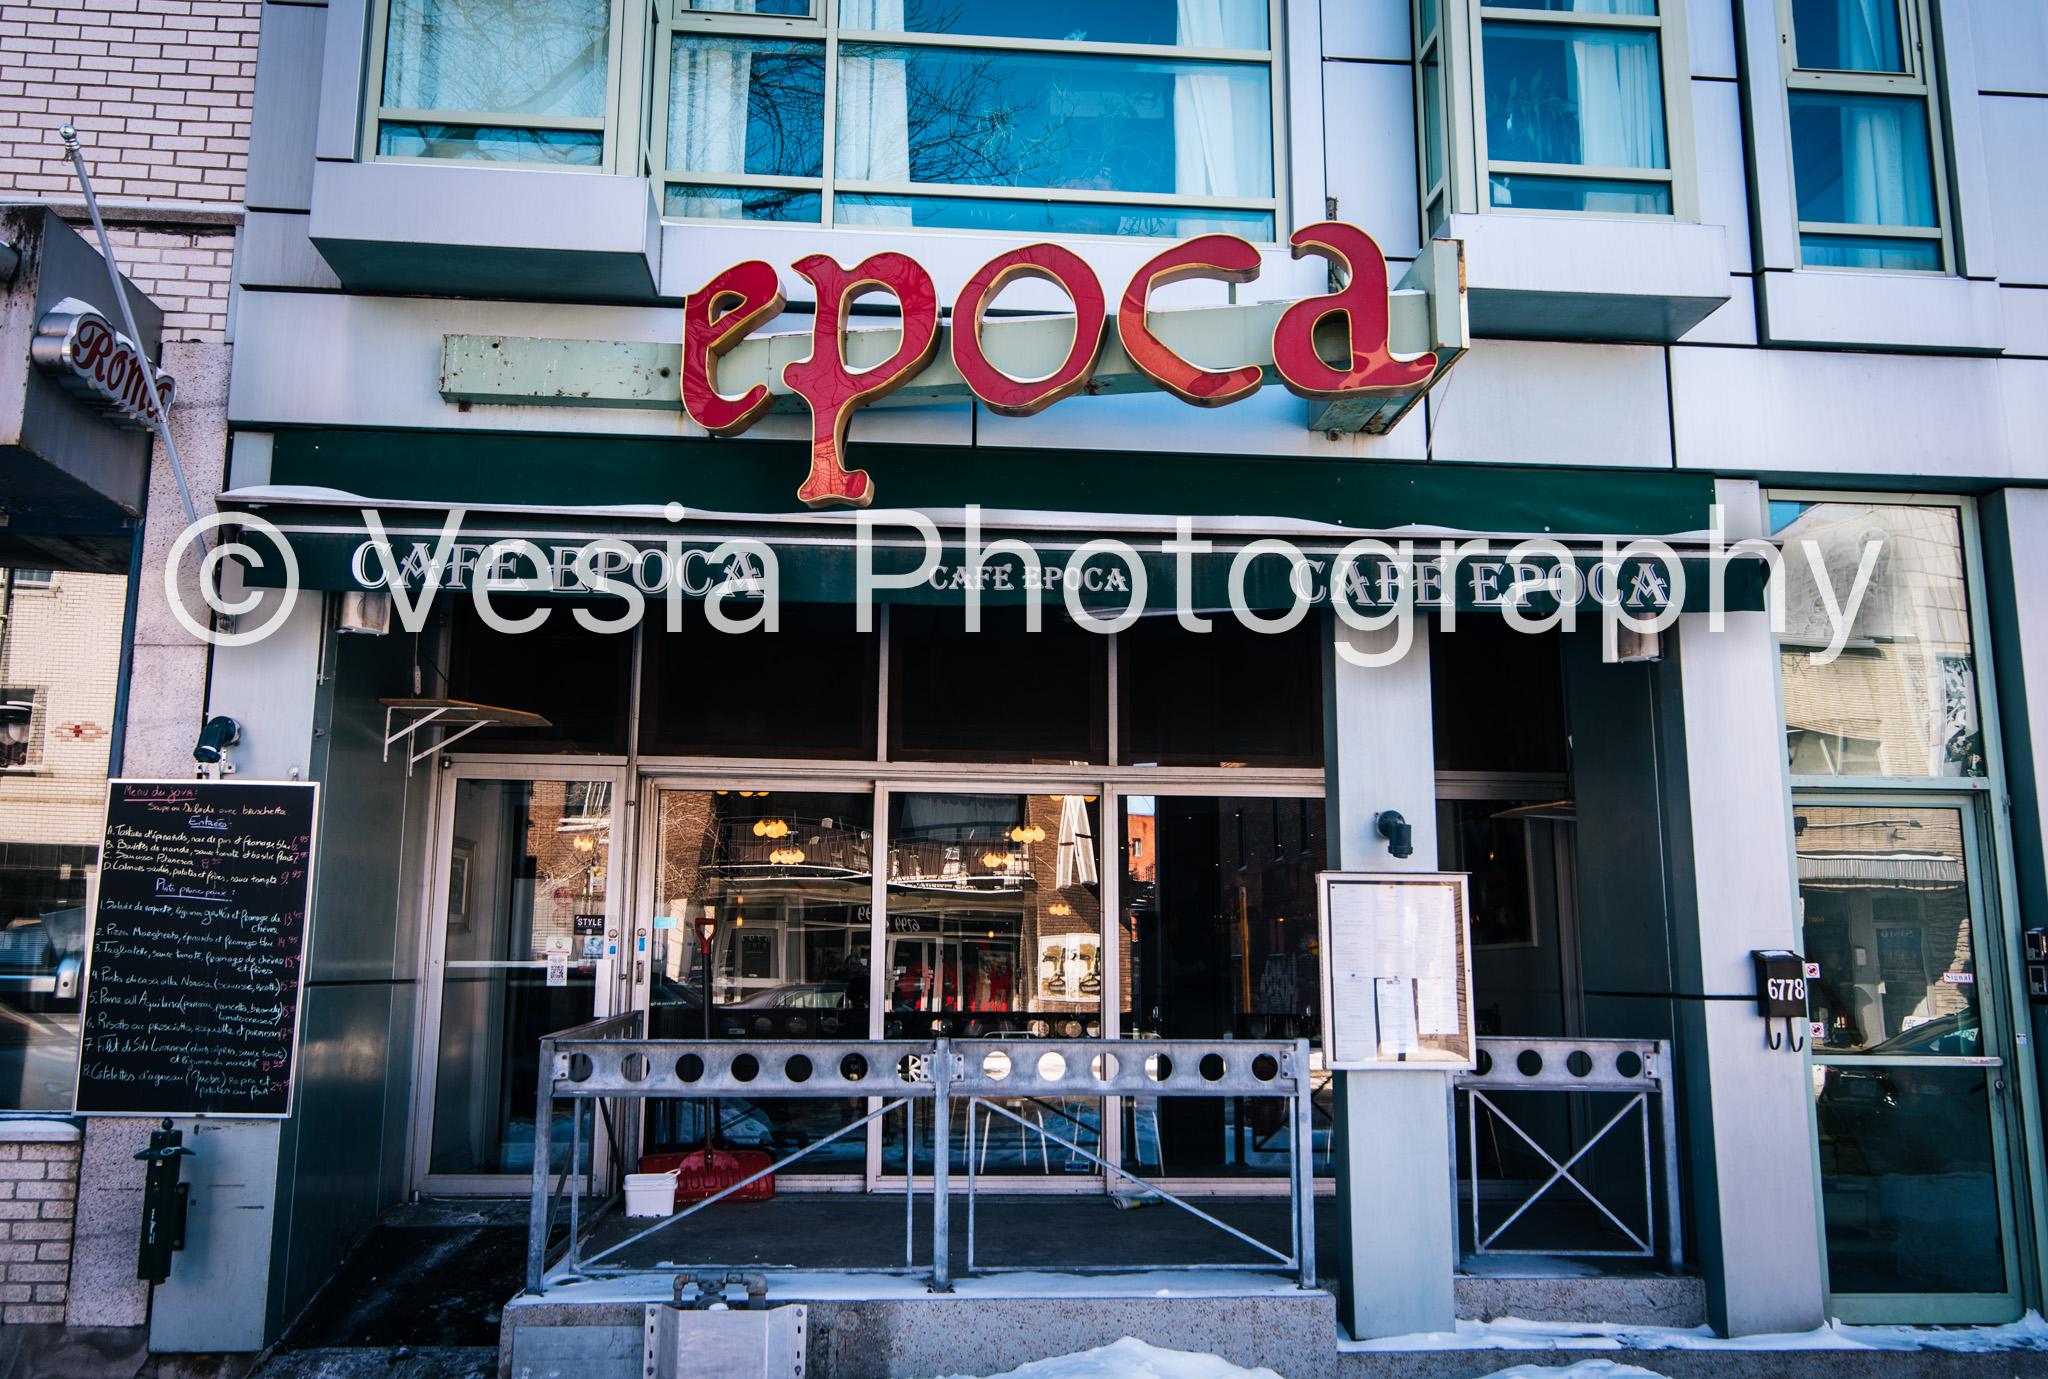 Cafe_Epoca_Proofs-18.jpg